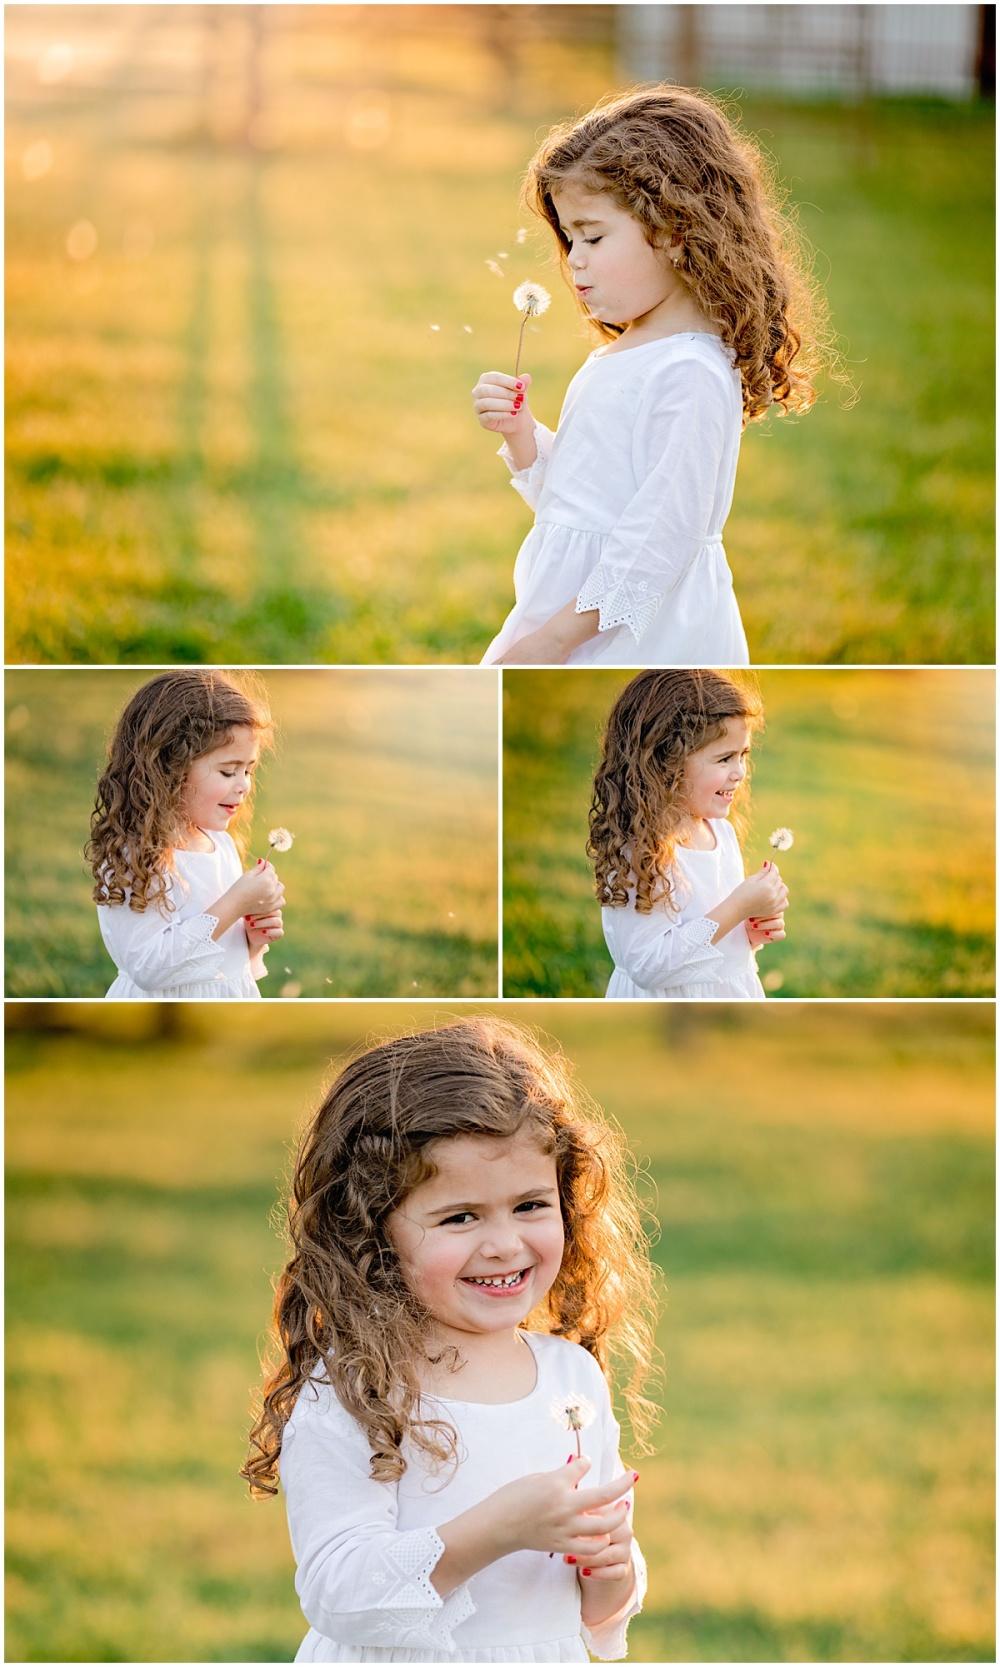 Wildflowers-Texas-Bluebonnets-Spring-Birthday-Photo-Session-Kids-Carly-Barton-Photography_0004.jpg